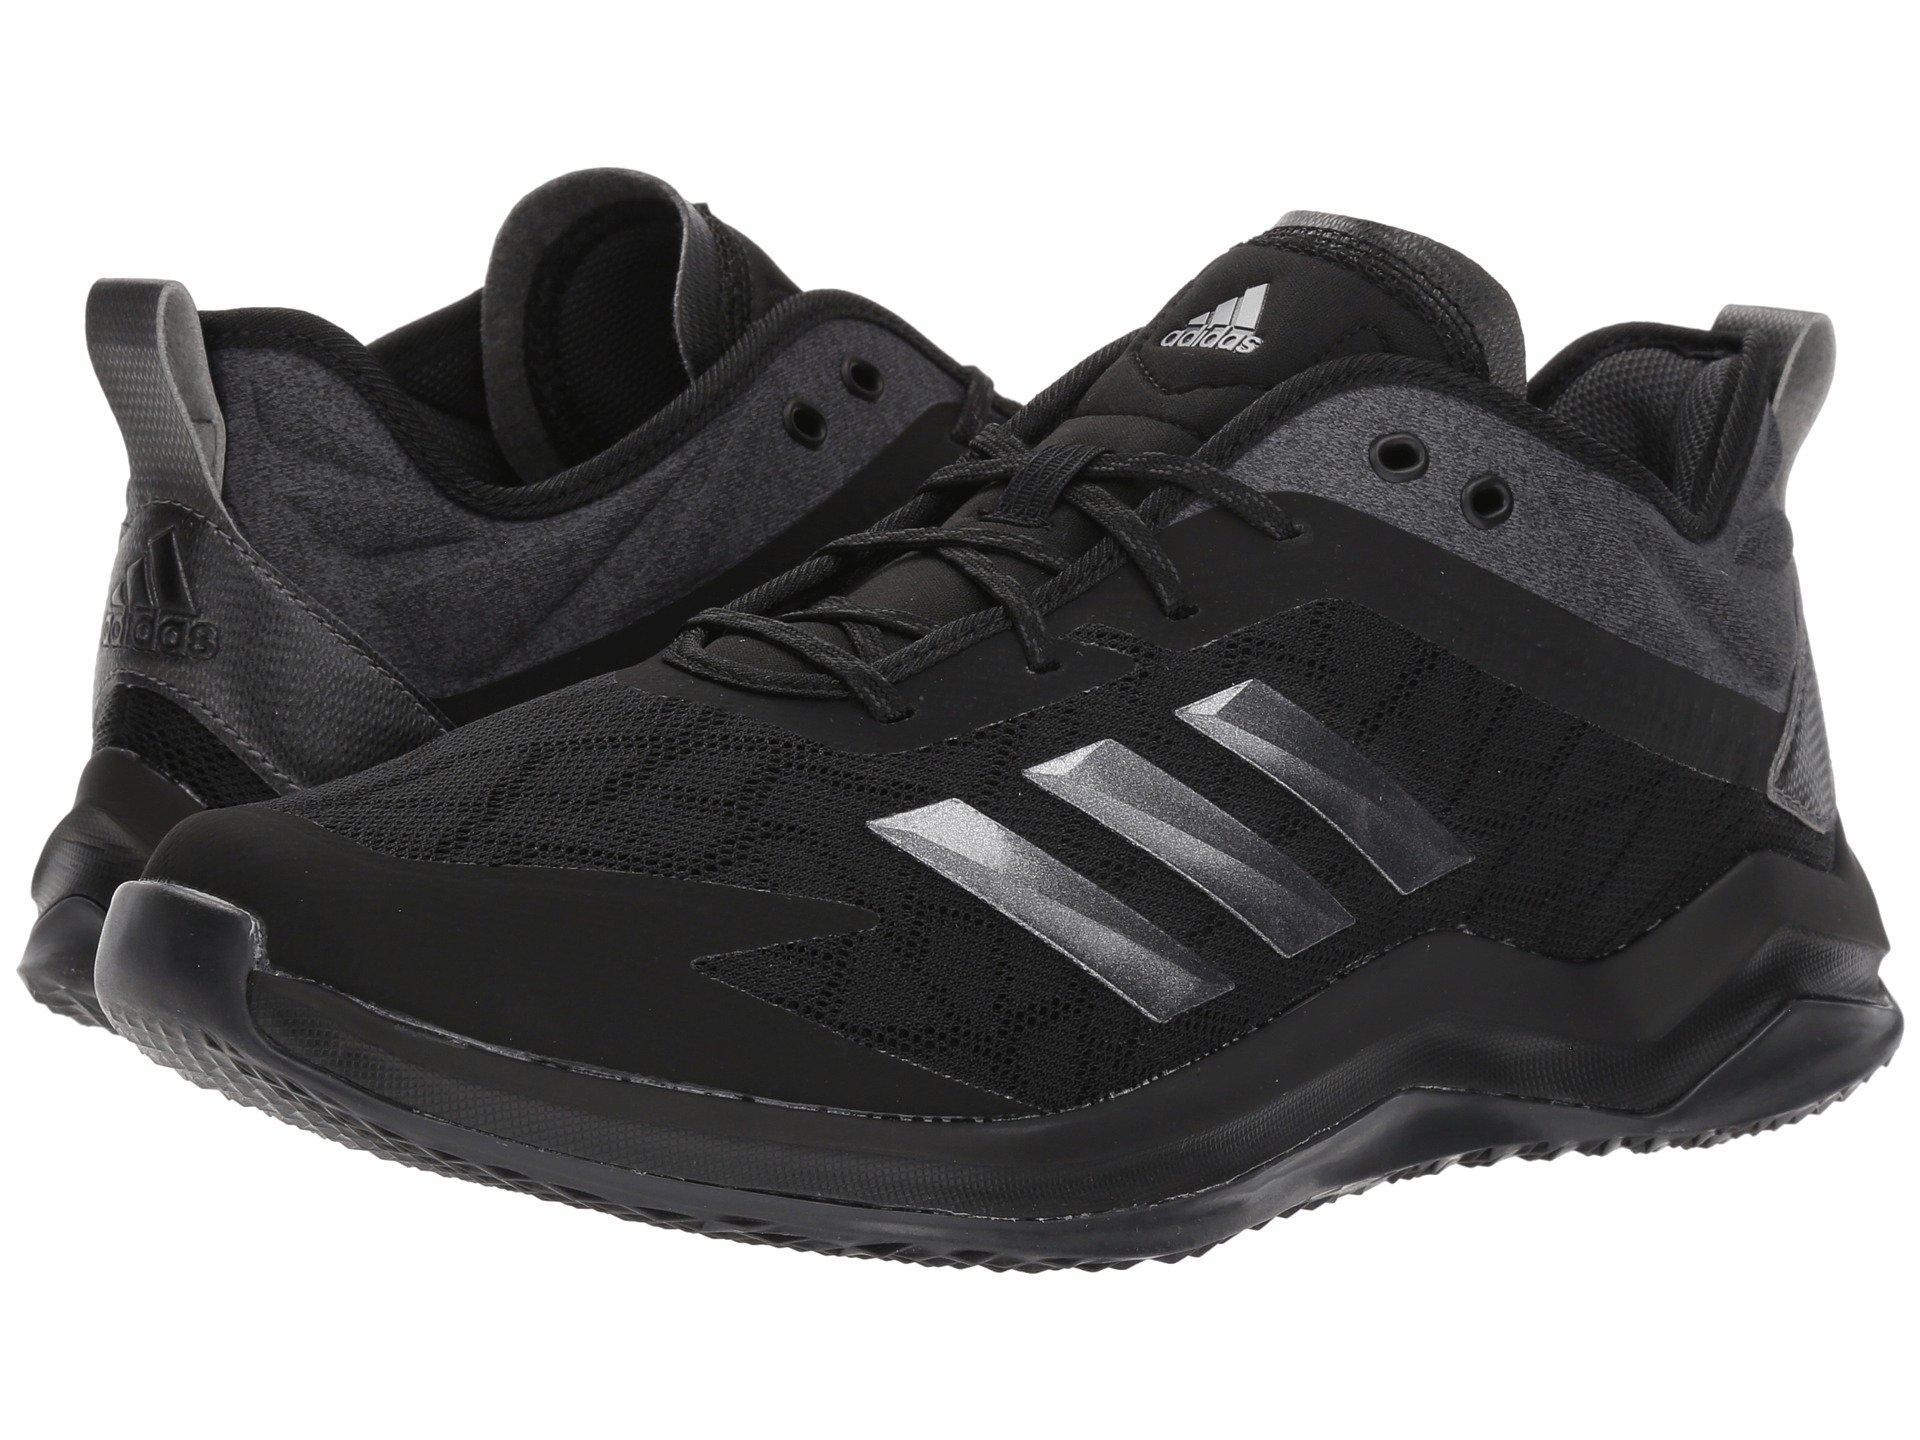 new styles 29ae4 33ce3 adidas. Black Speed Trainer 4 (navycrystal Whitedark ...